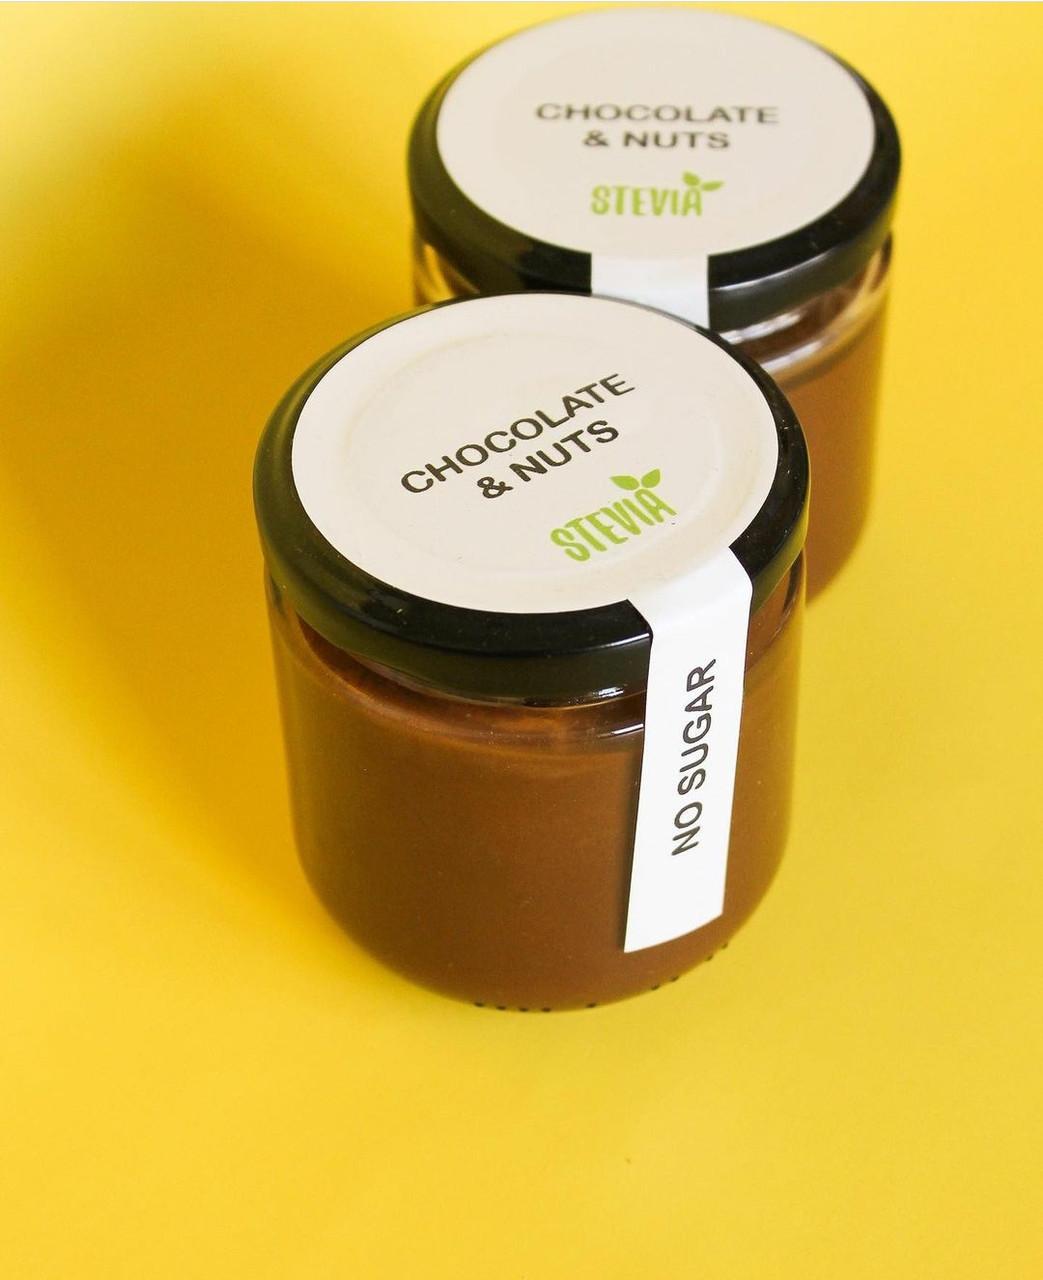 Шоколадно-горіхова паста з фундуком, без цукру